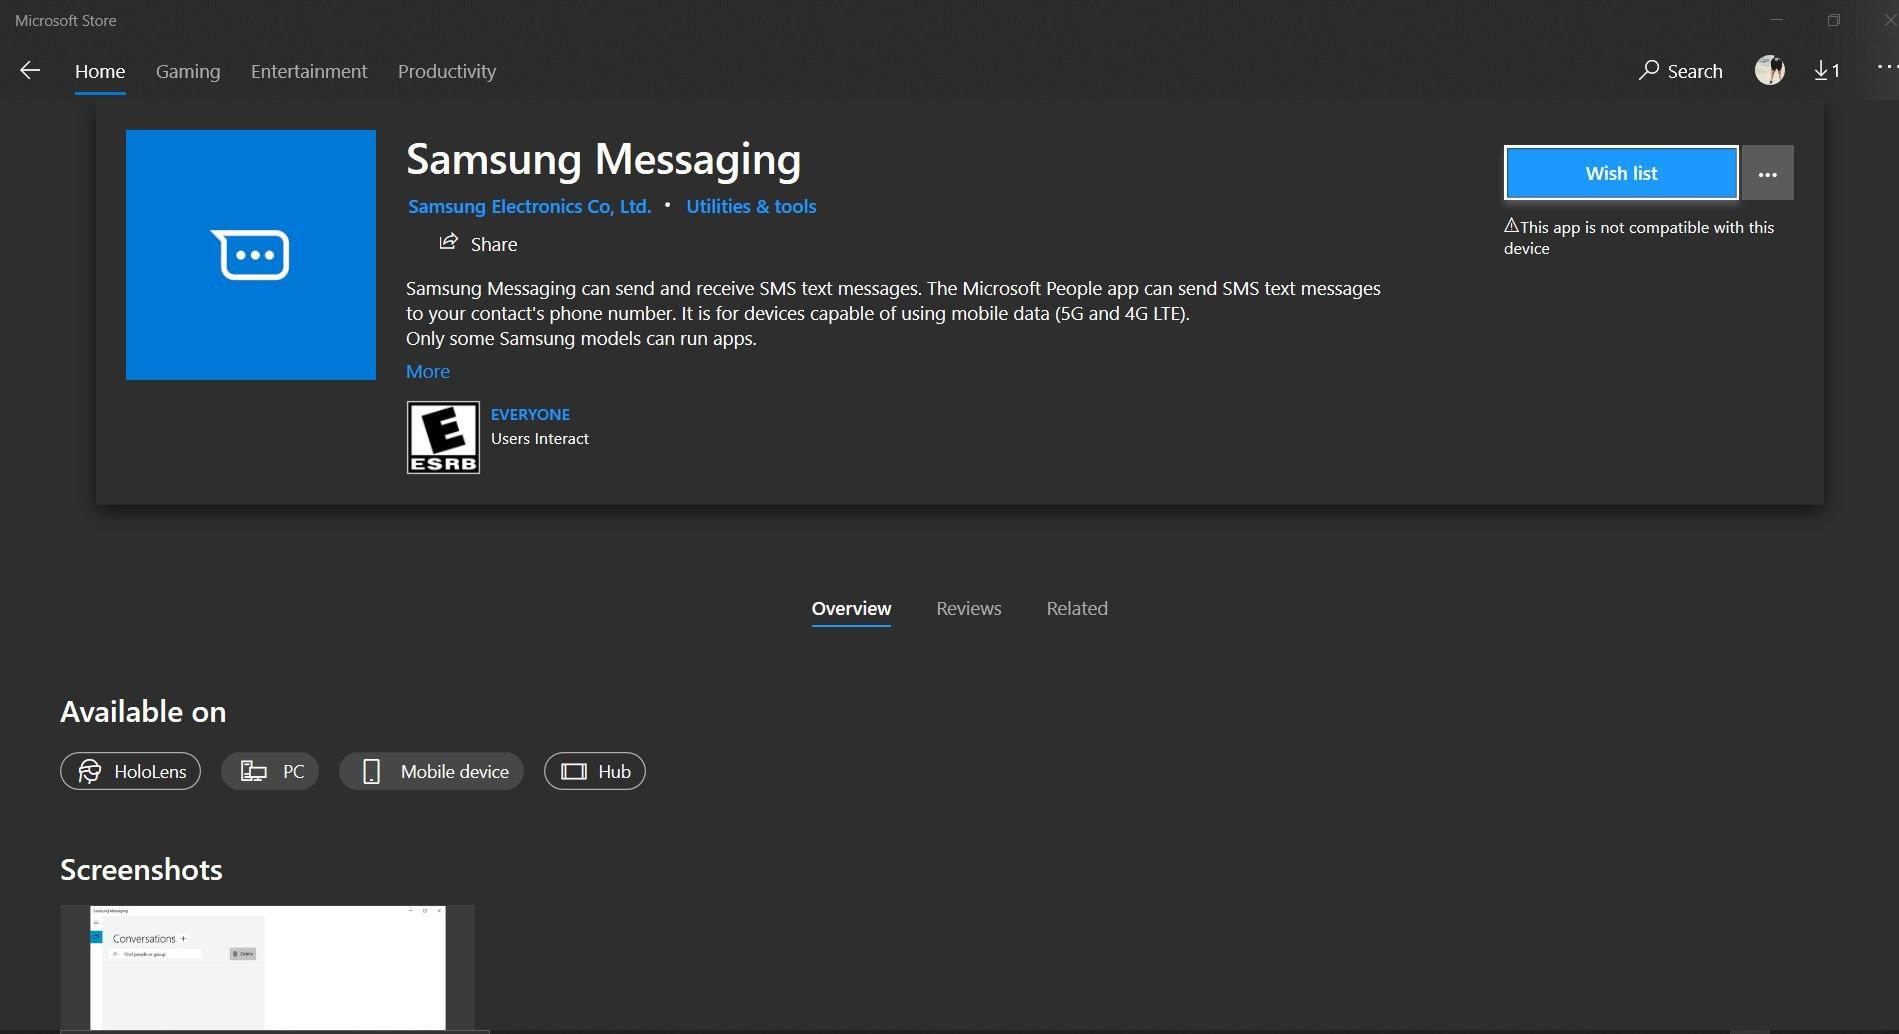 Samsung Messaging